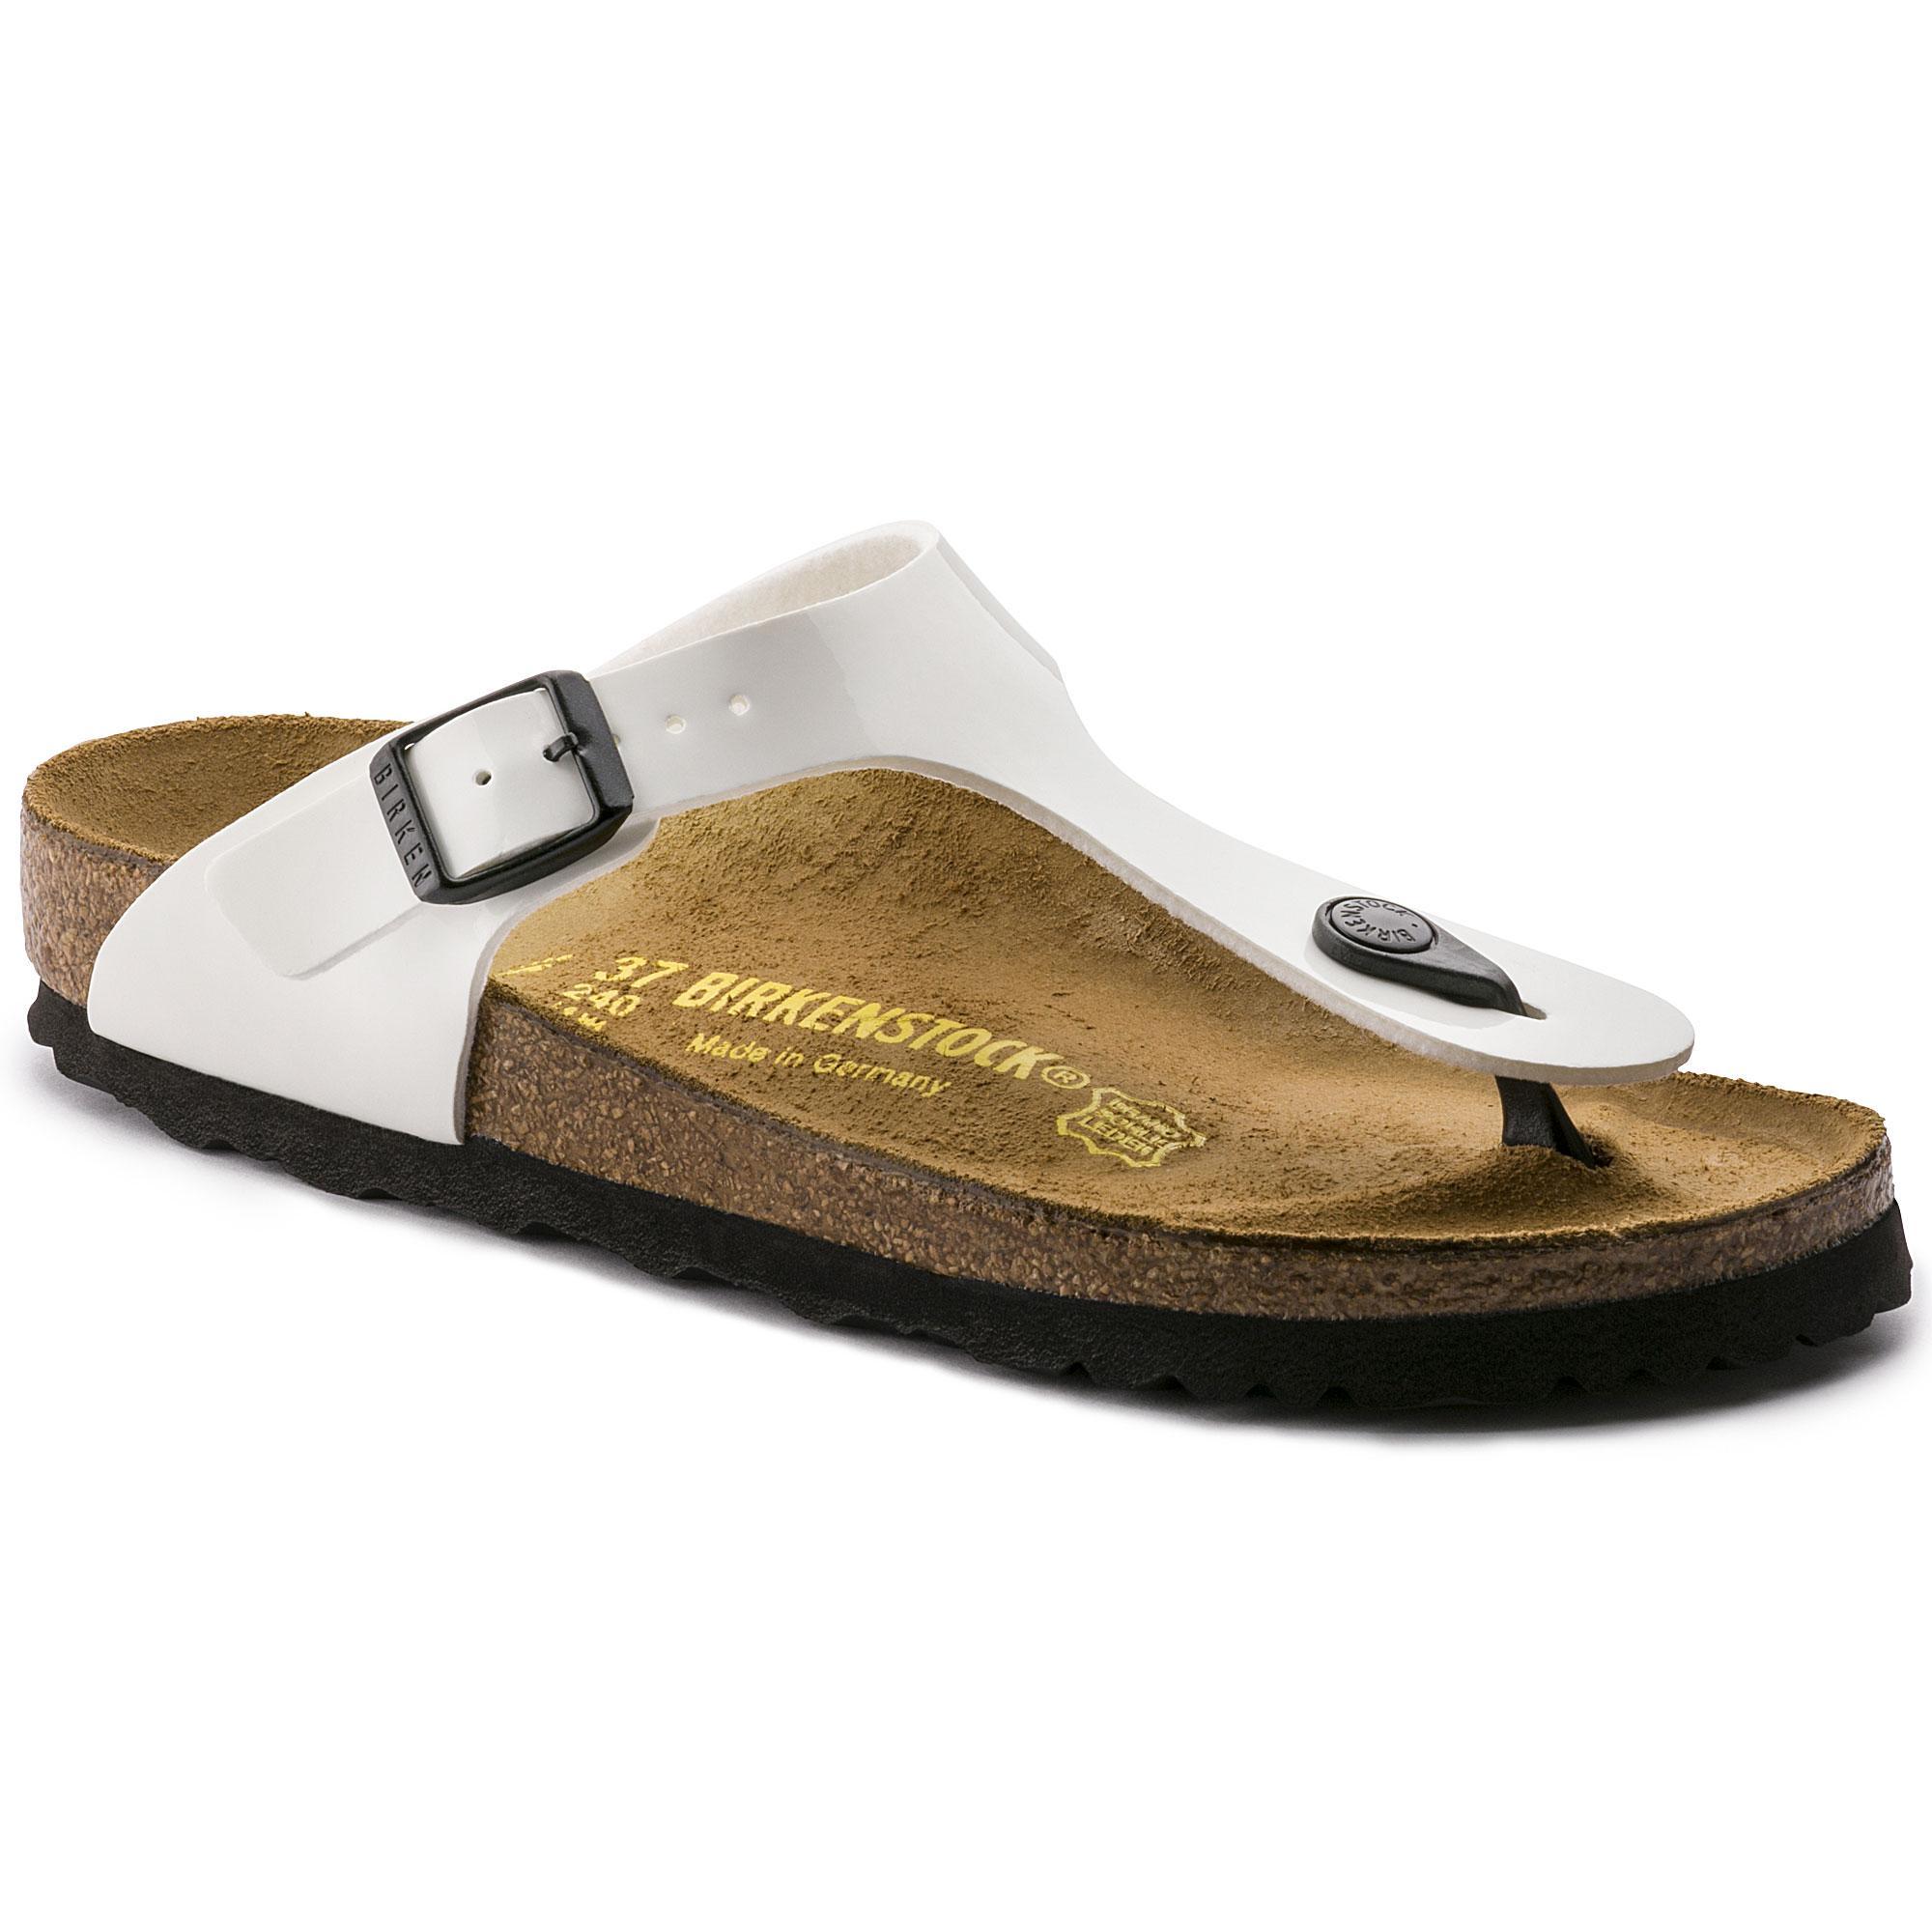 7f713603a64 Flat Sandals for Women for sale - Summer Sandals online brands ...